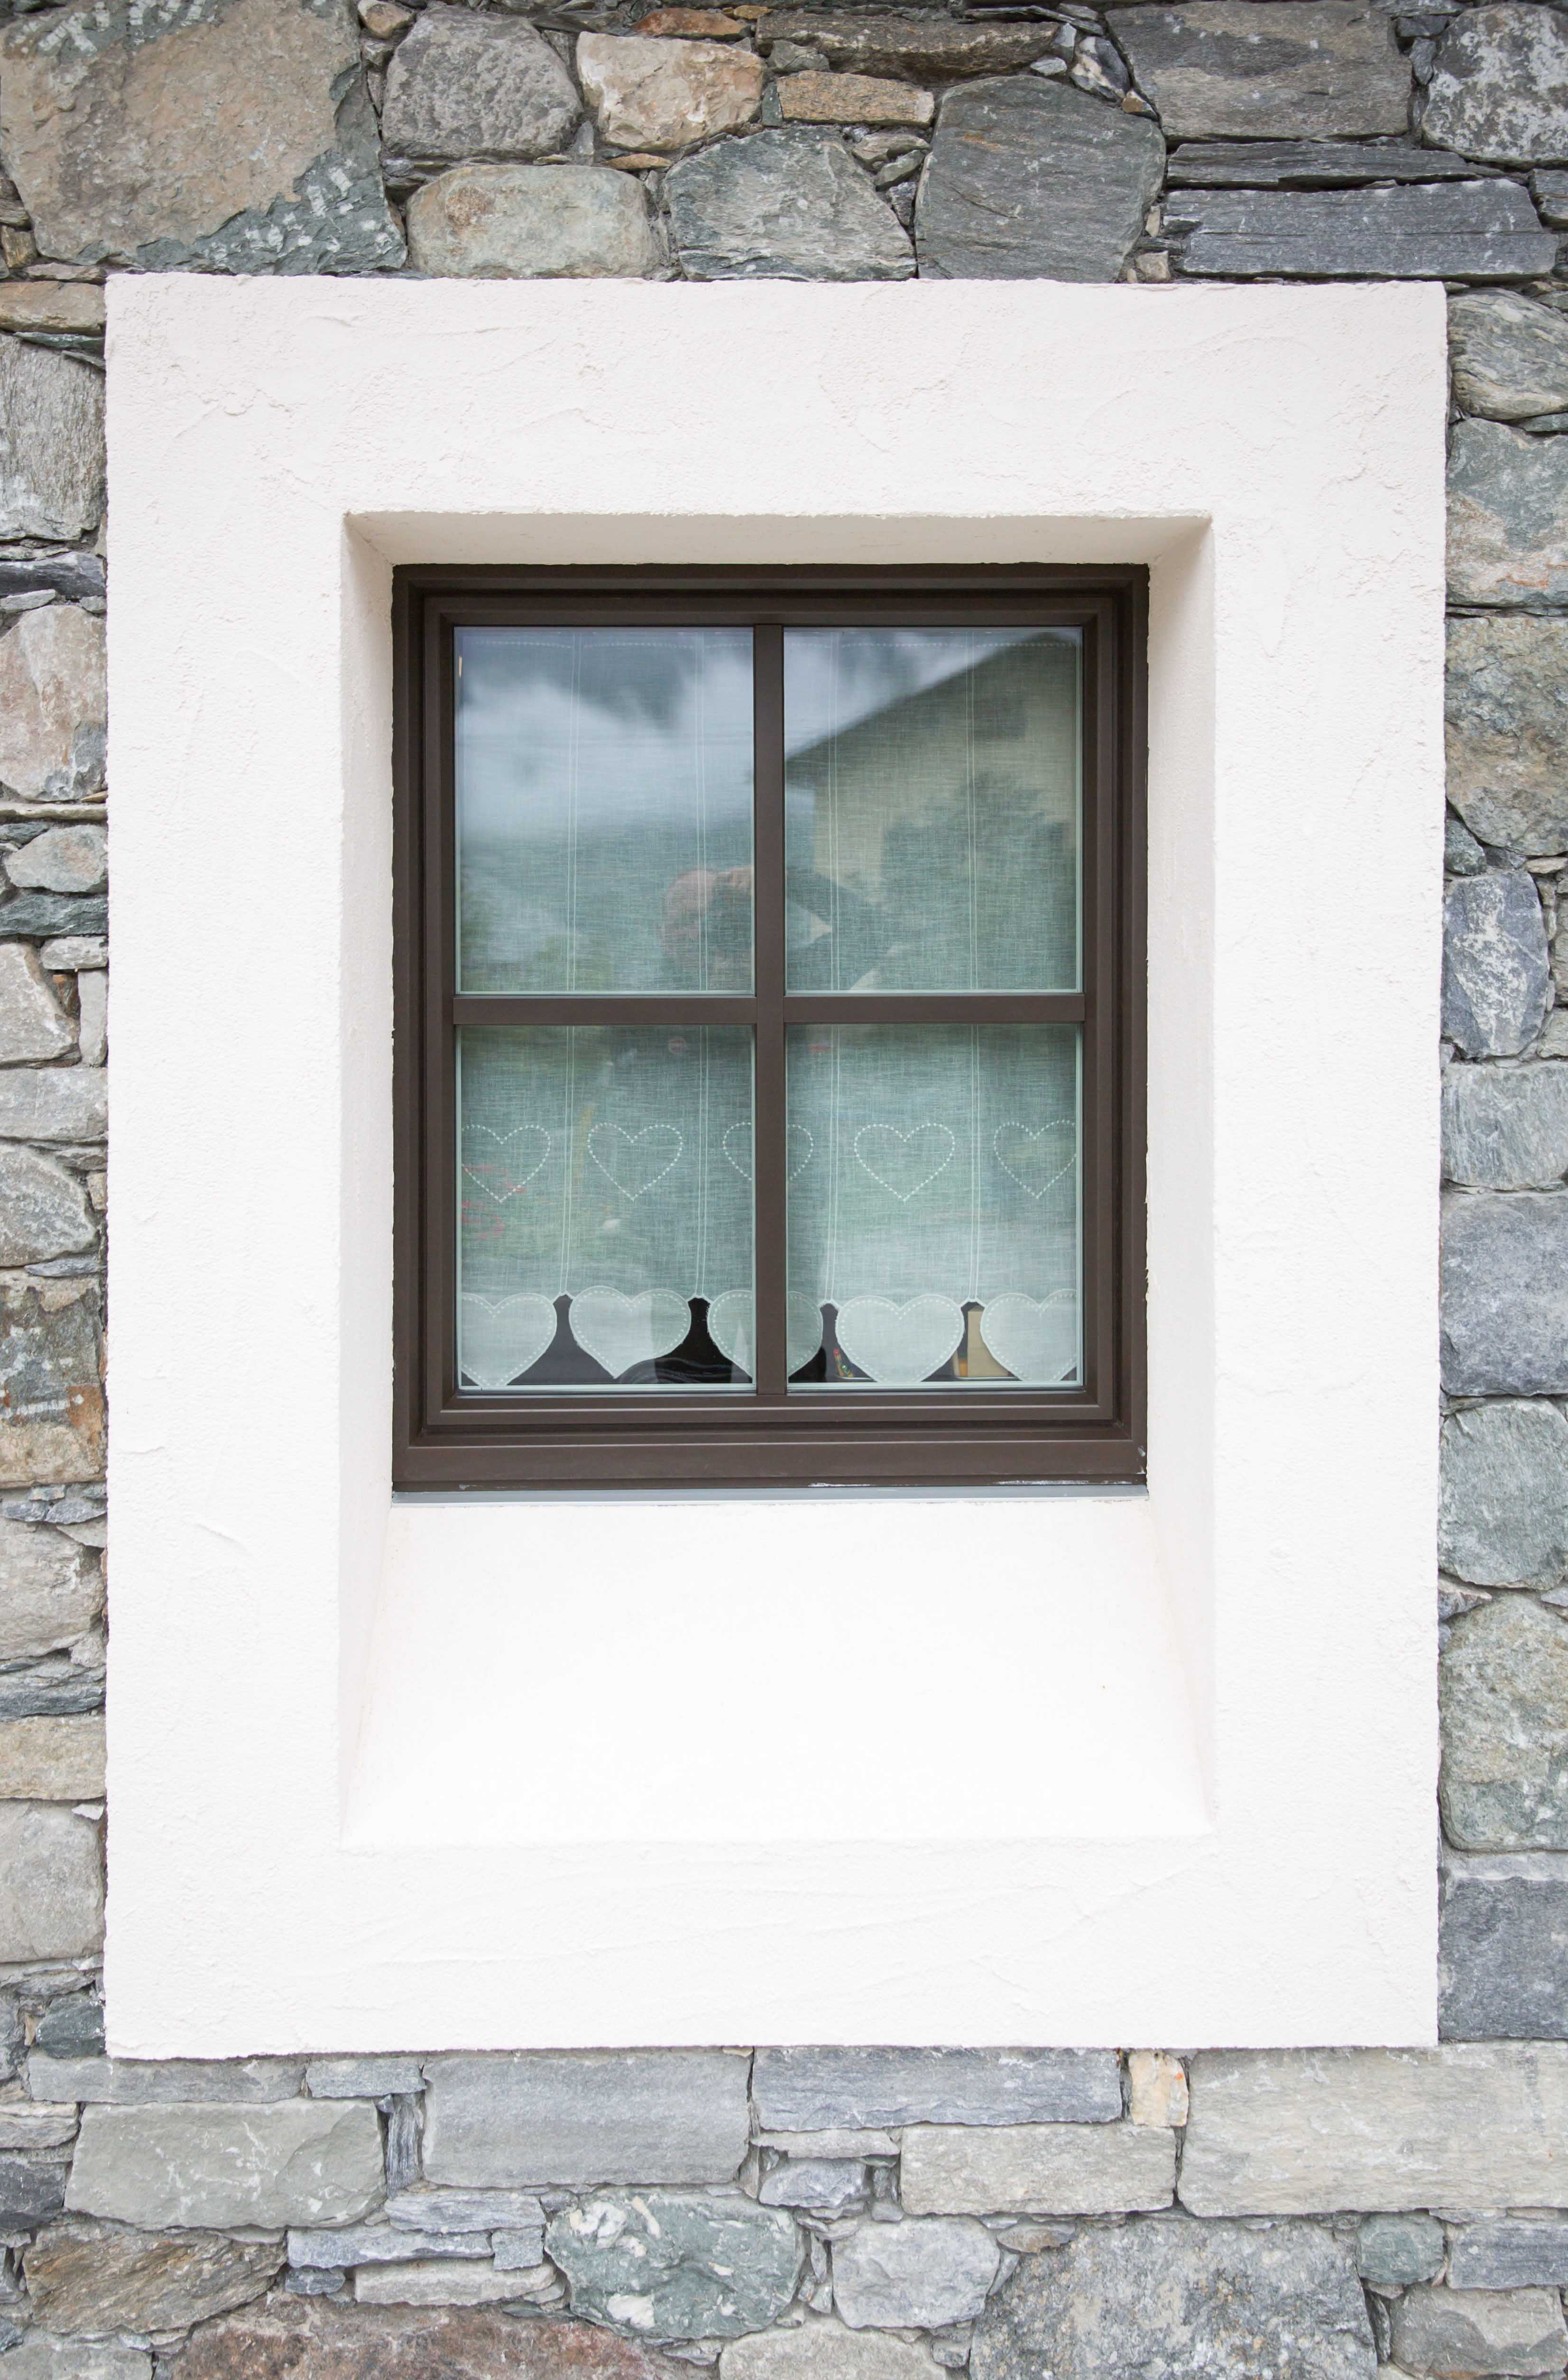 Panificio, Fenis, Valle d'Aosta